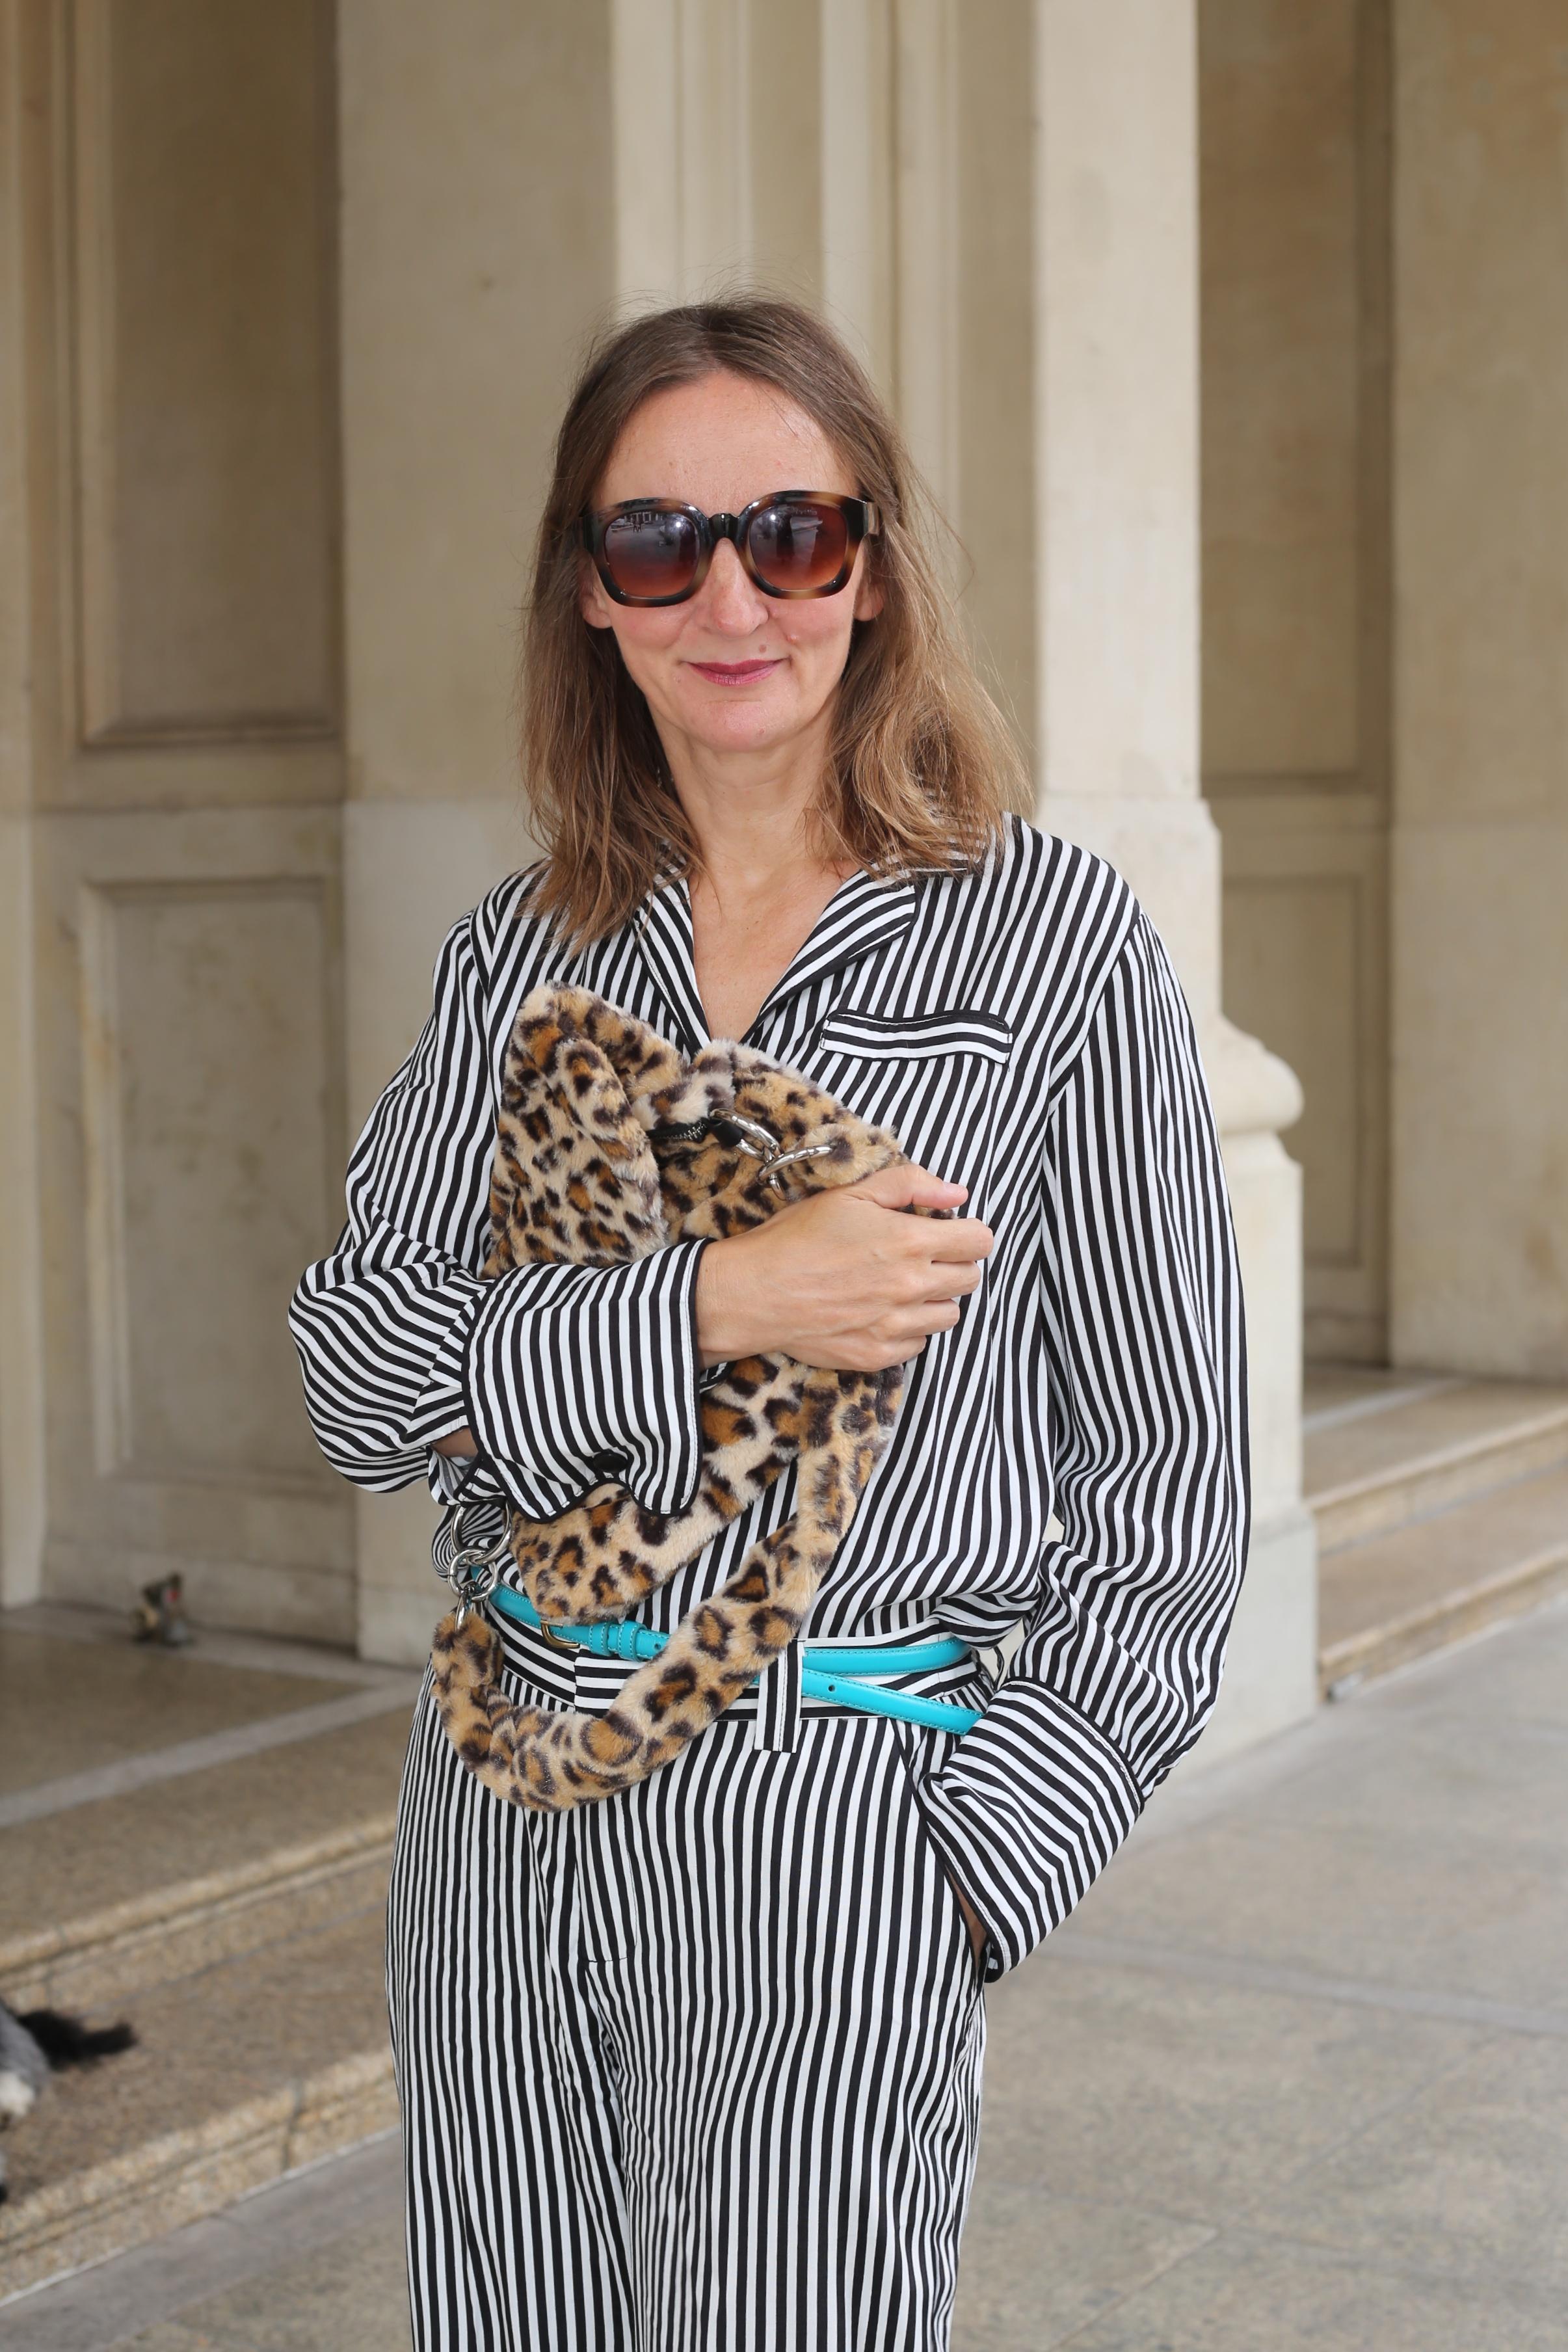 pyjama-look-2018_trend_weite-hose-streifen-bluse_pyjama-stil_mode-blog-ue50_frankfurt_influencer_oceanblue-style-01